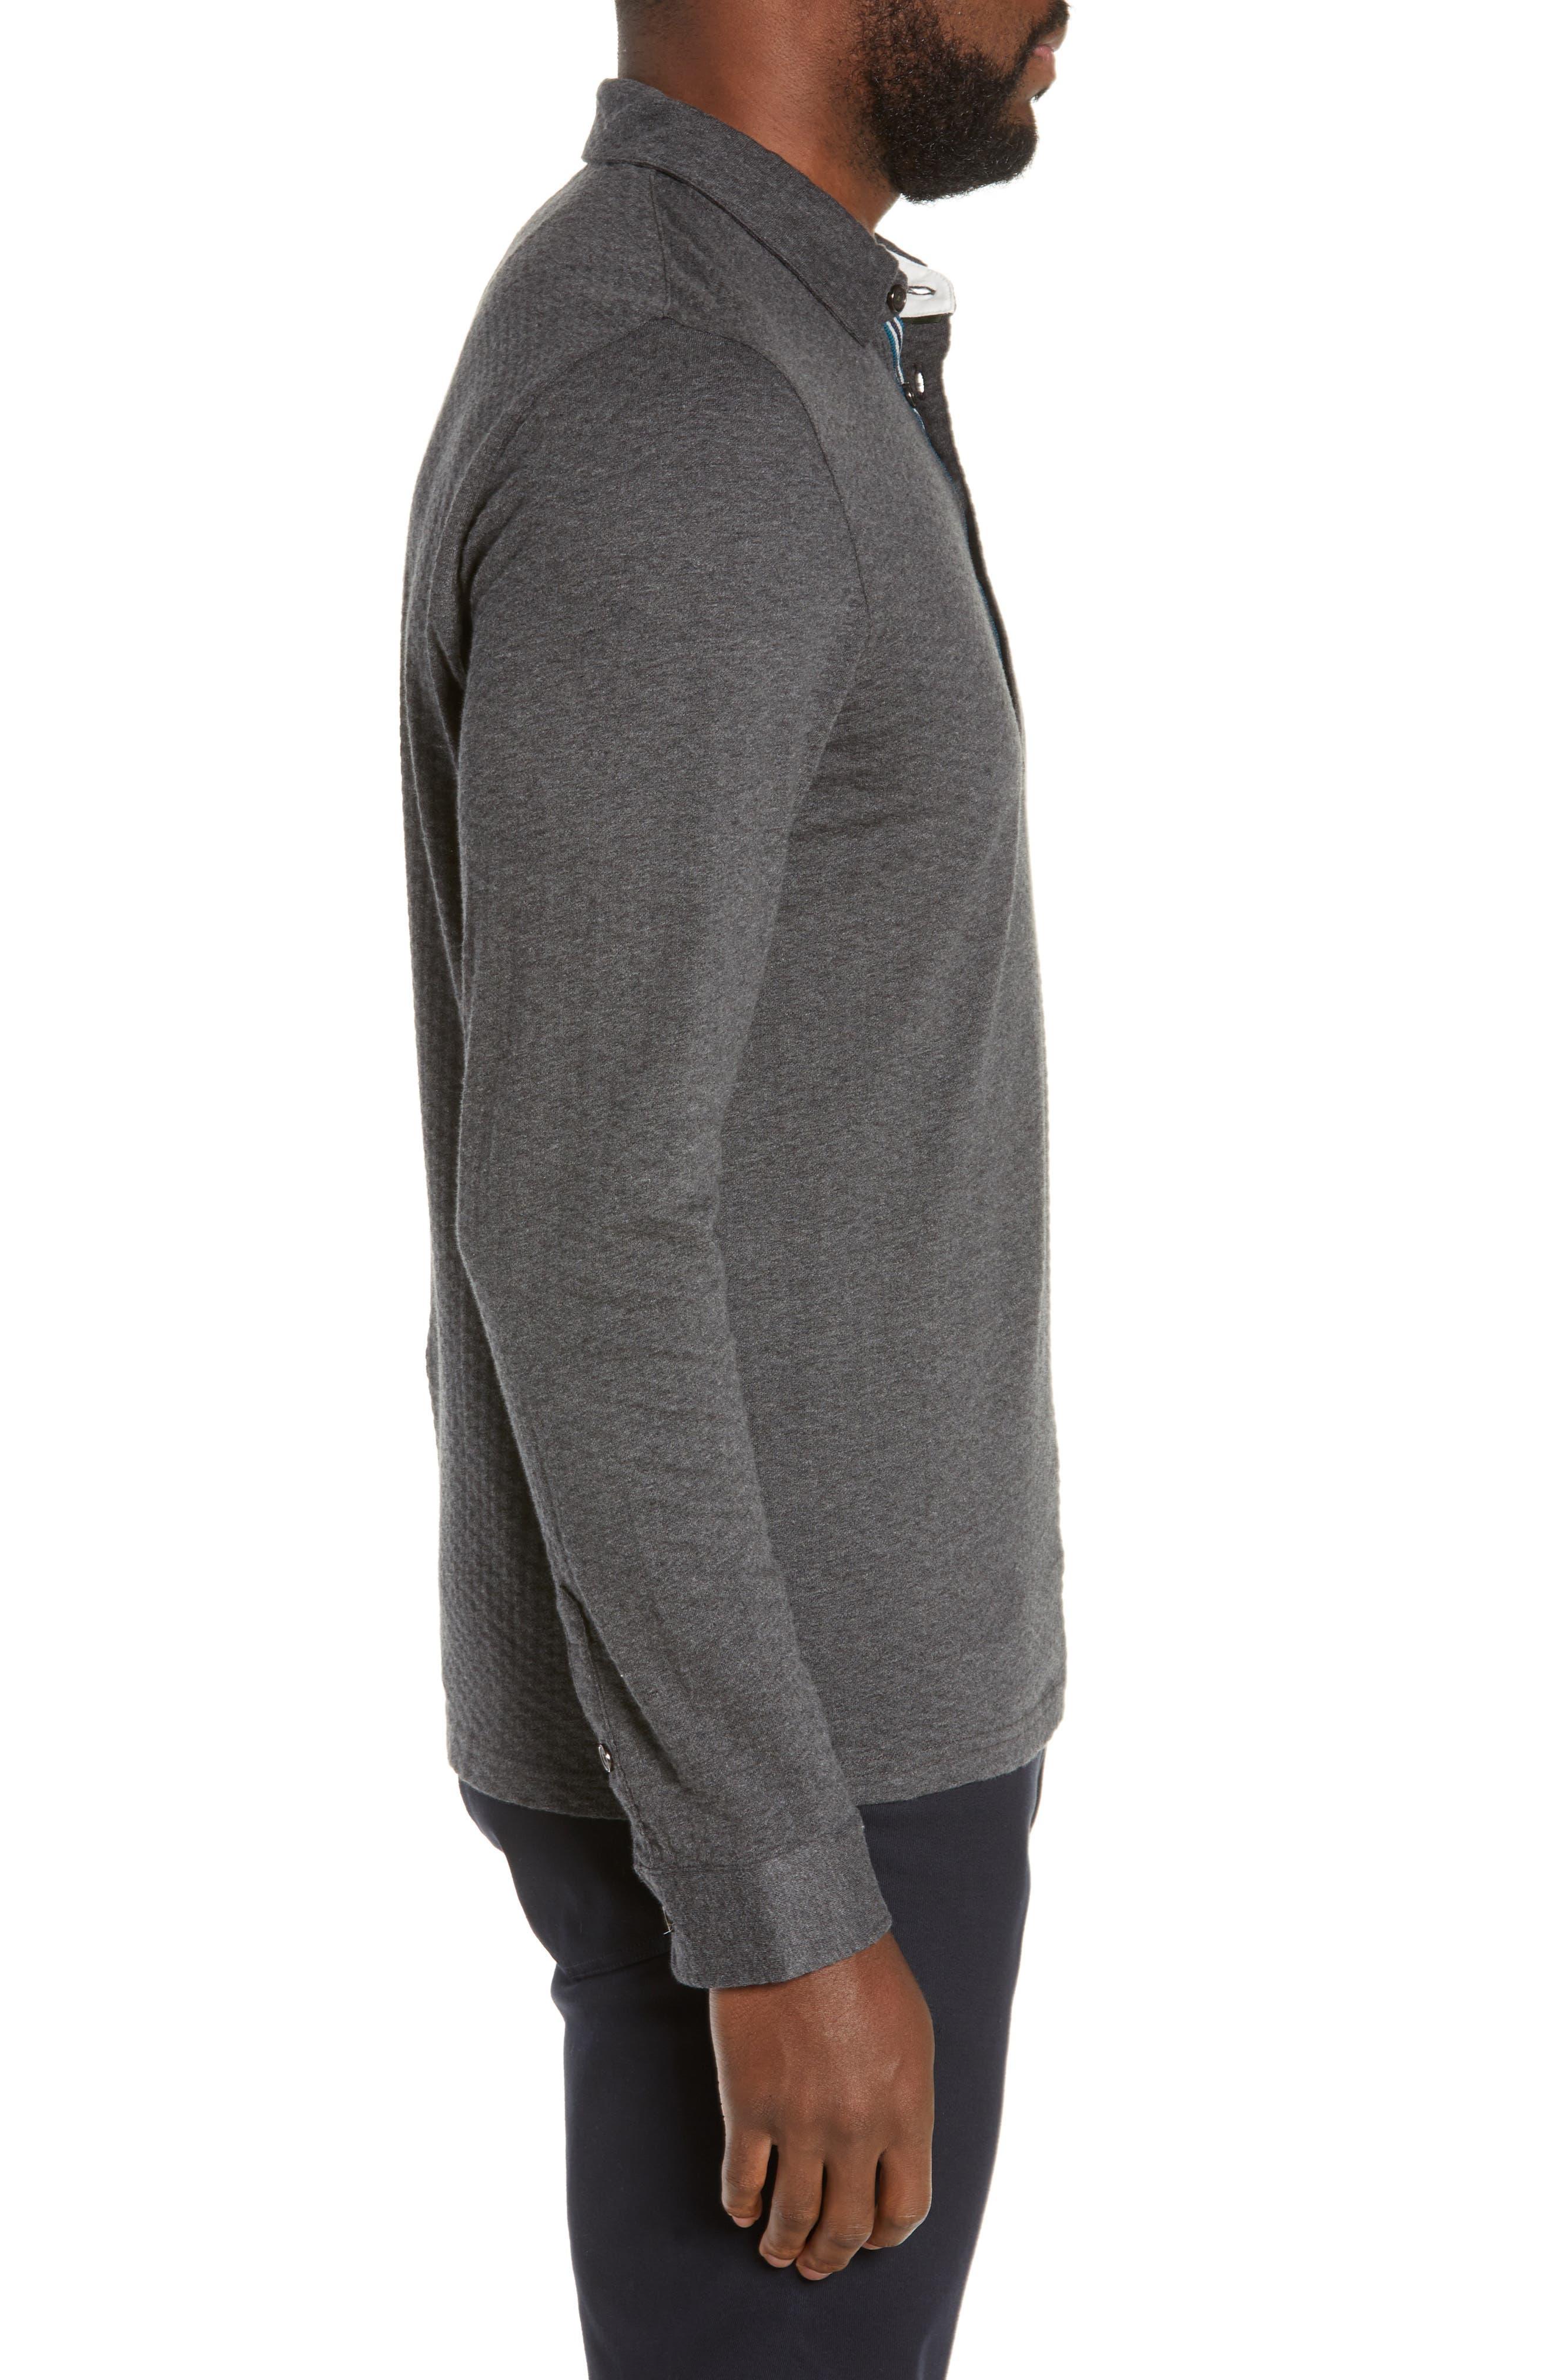 TED BAKER LONDON, Fruitpa Slim Fit Long Sleeve Polo, Alternate thumbnail 3, color, CHARCOAL